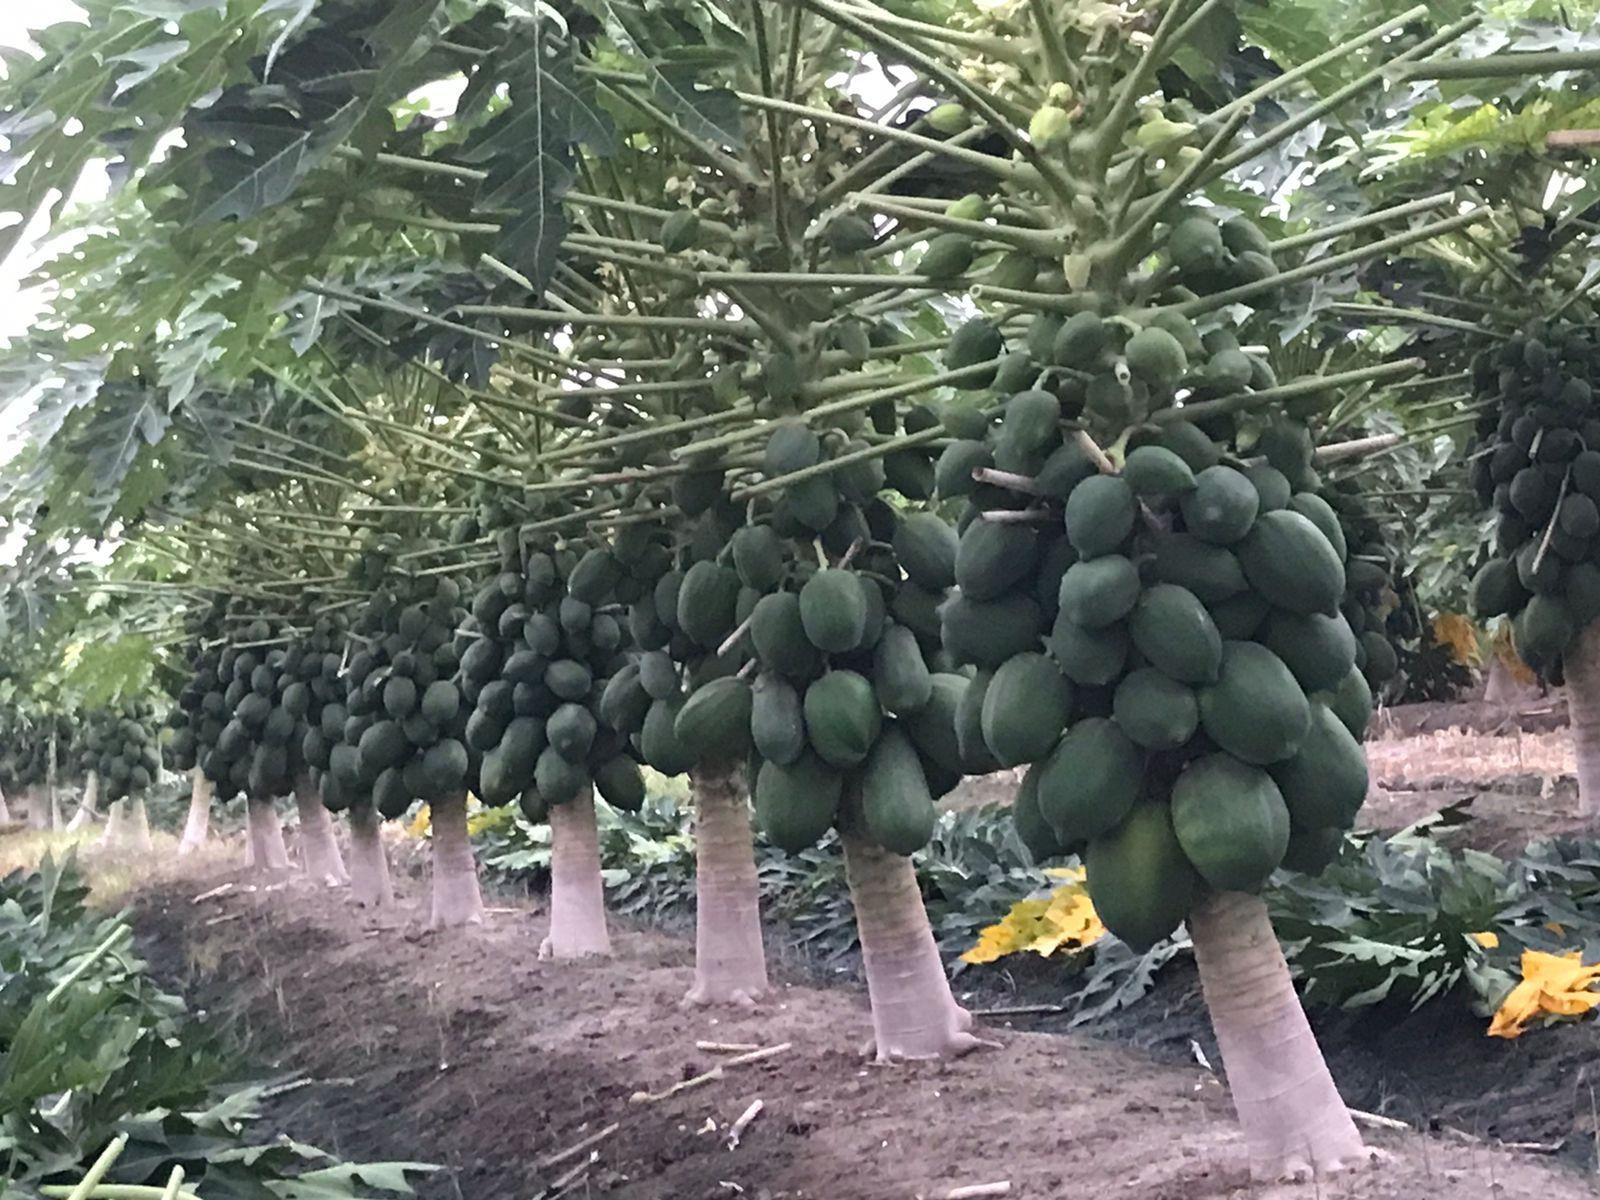 Papaya Management   Council for Social Development (CSD)